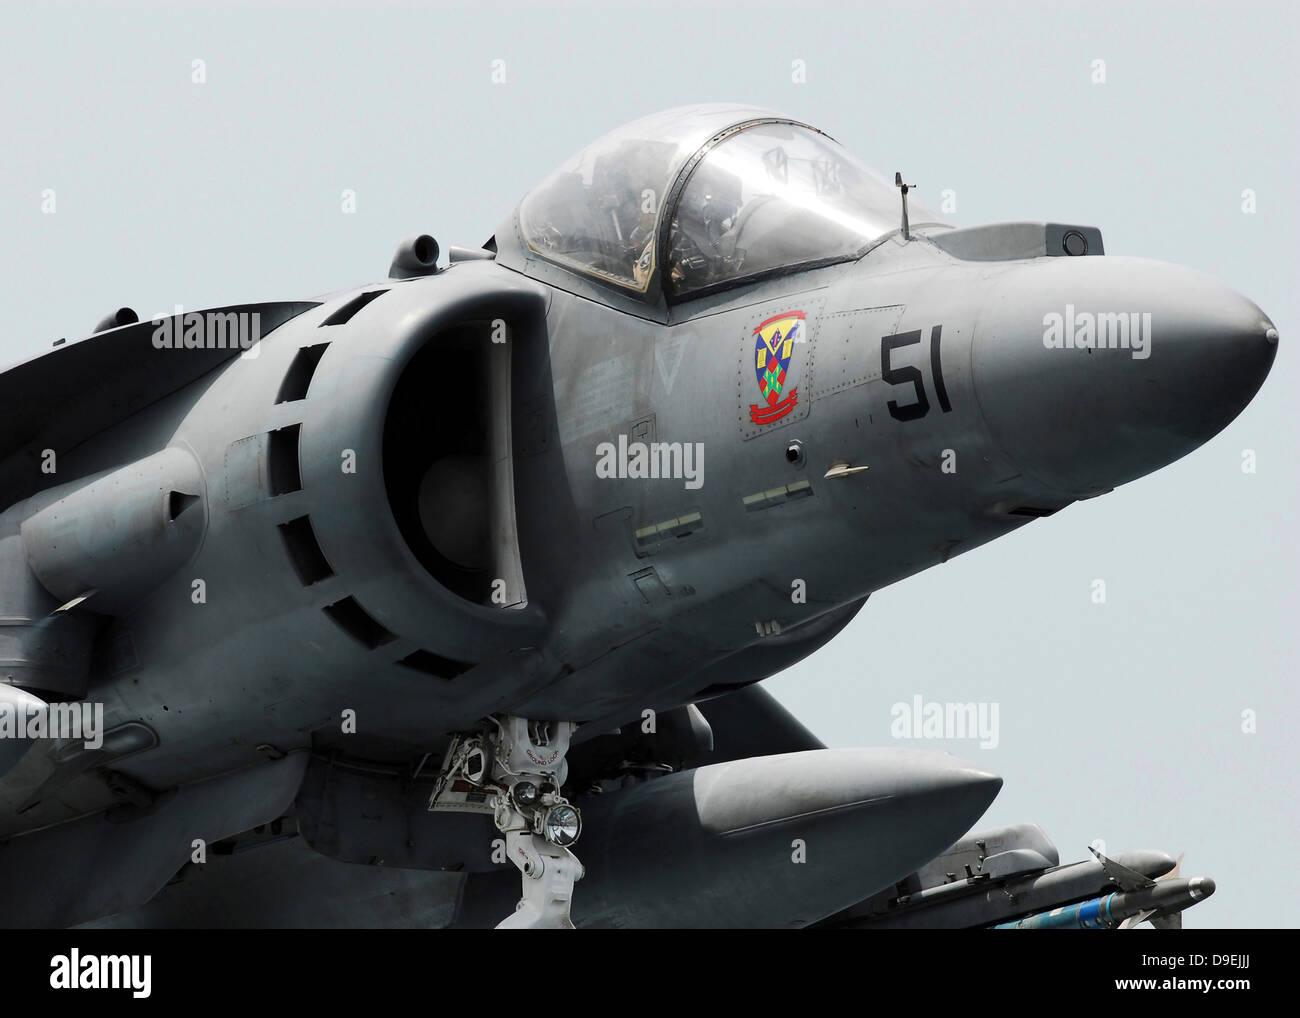 Close-up view of an AV-8B Harrier II. - Stock Image